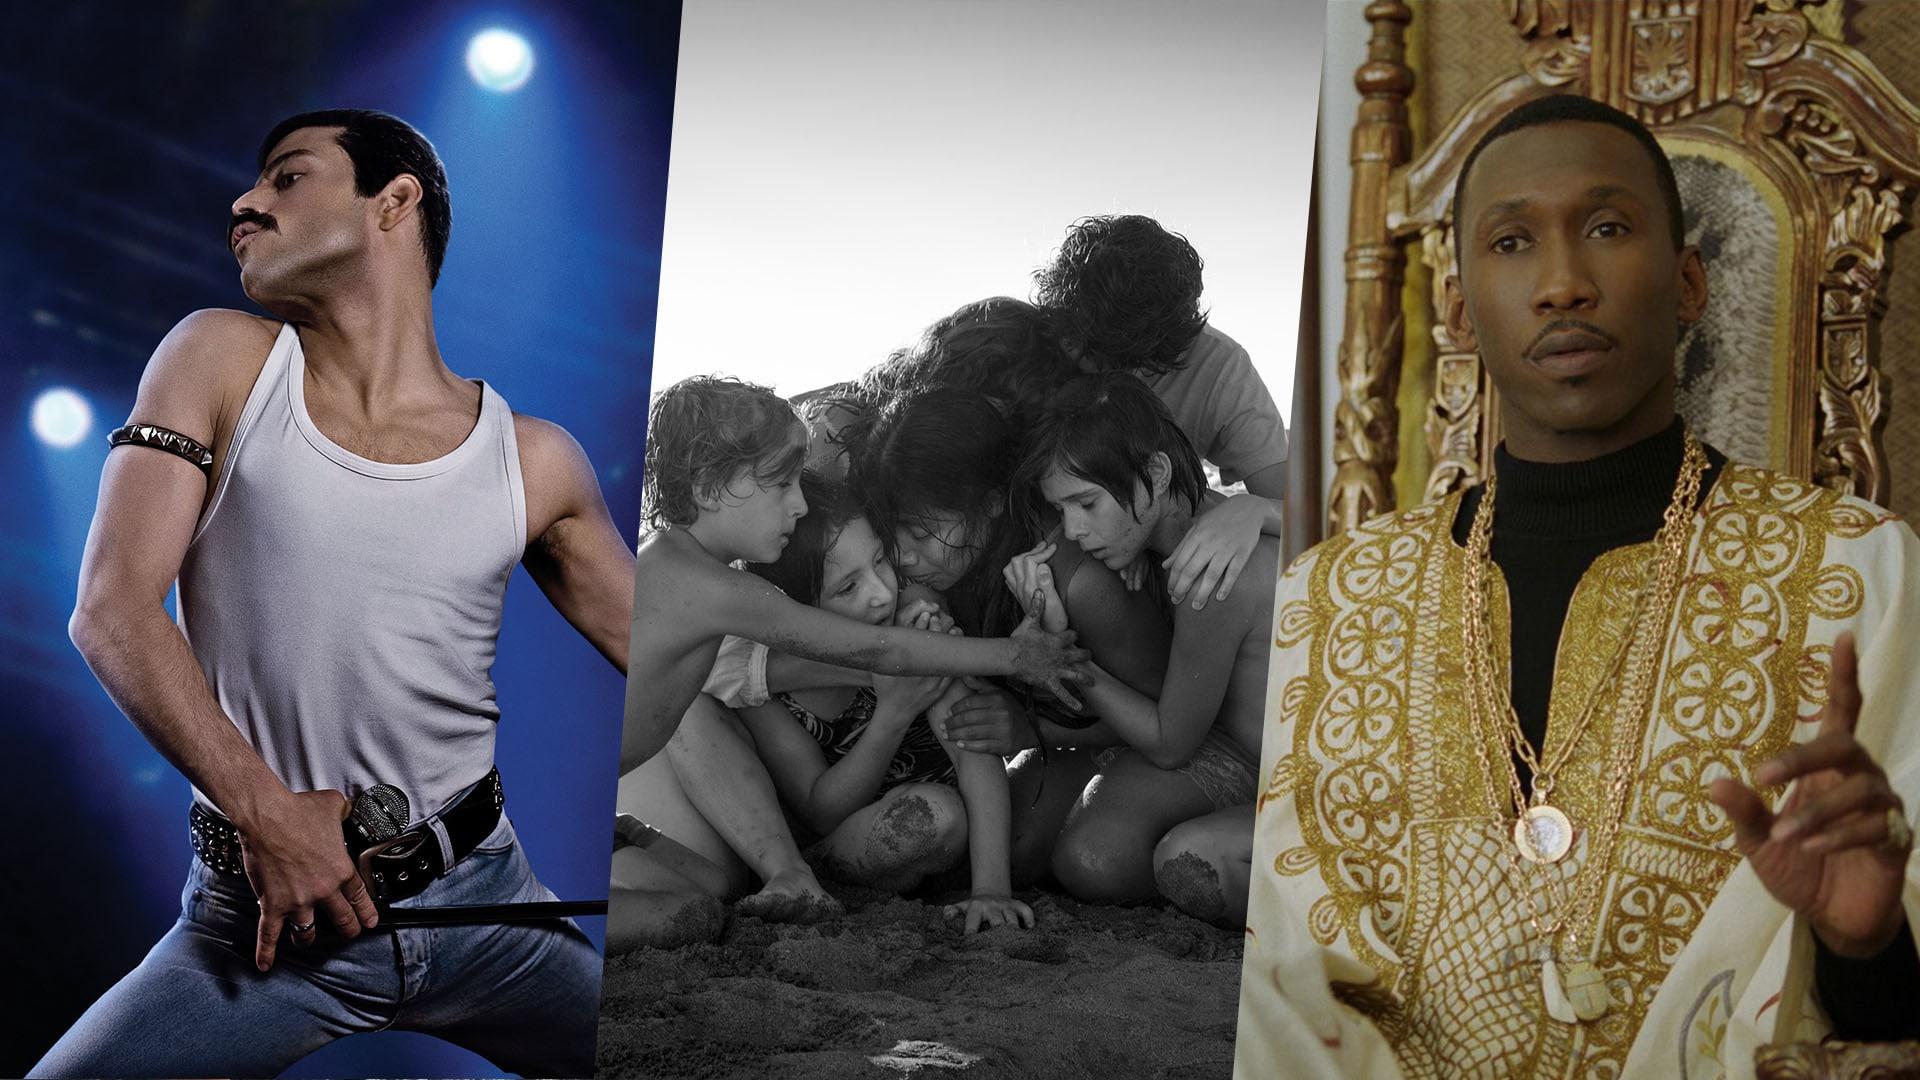 Golden Globes 2019: Netflix Wins Big as Fox's Bohemian Rhapsody Jostles for Oscar Momentum With Roma, Green Book